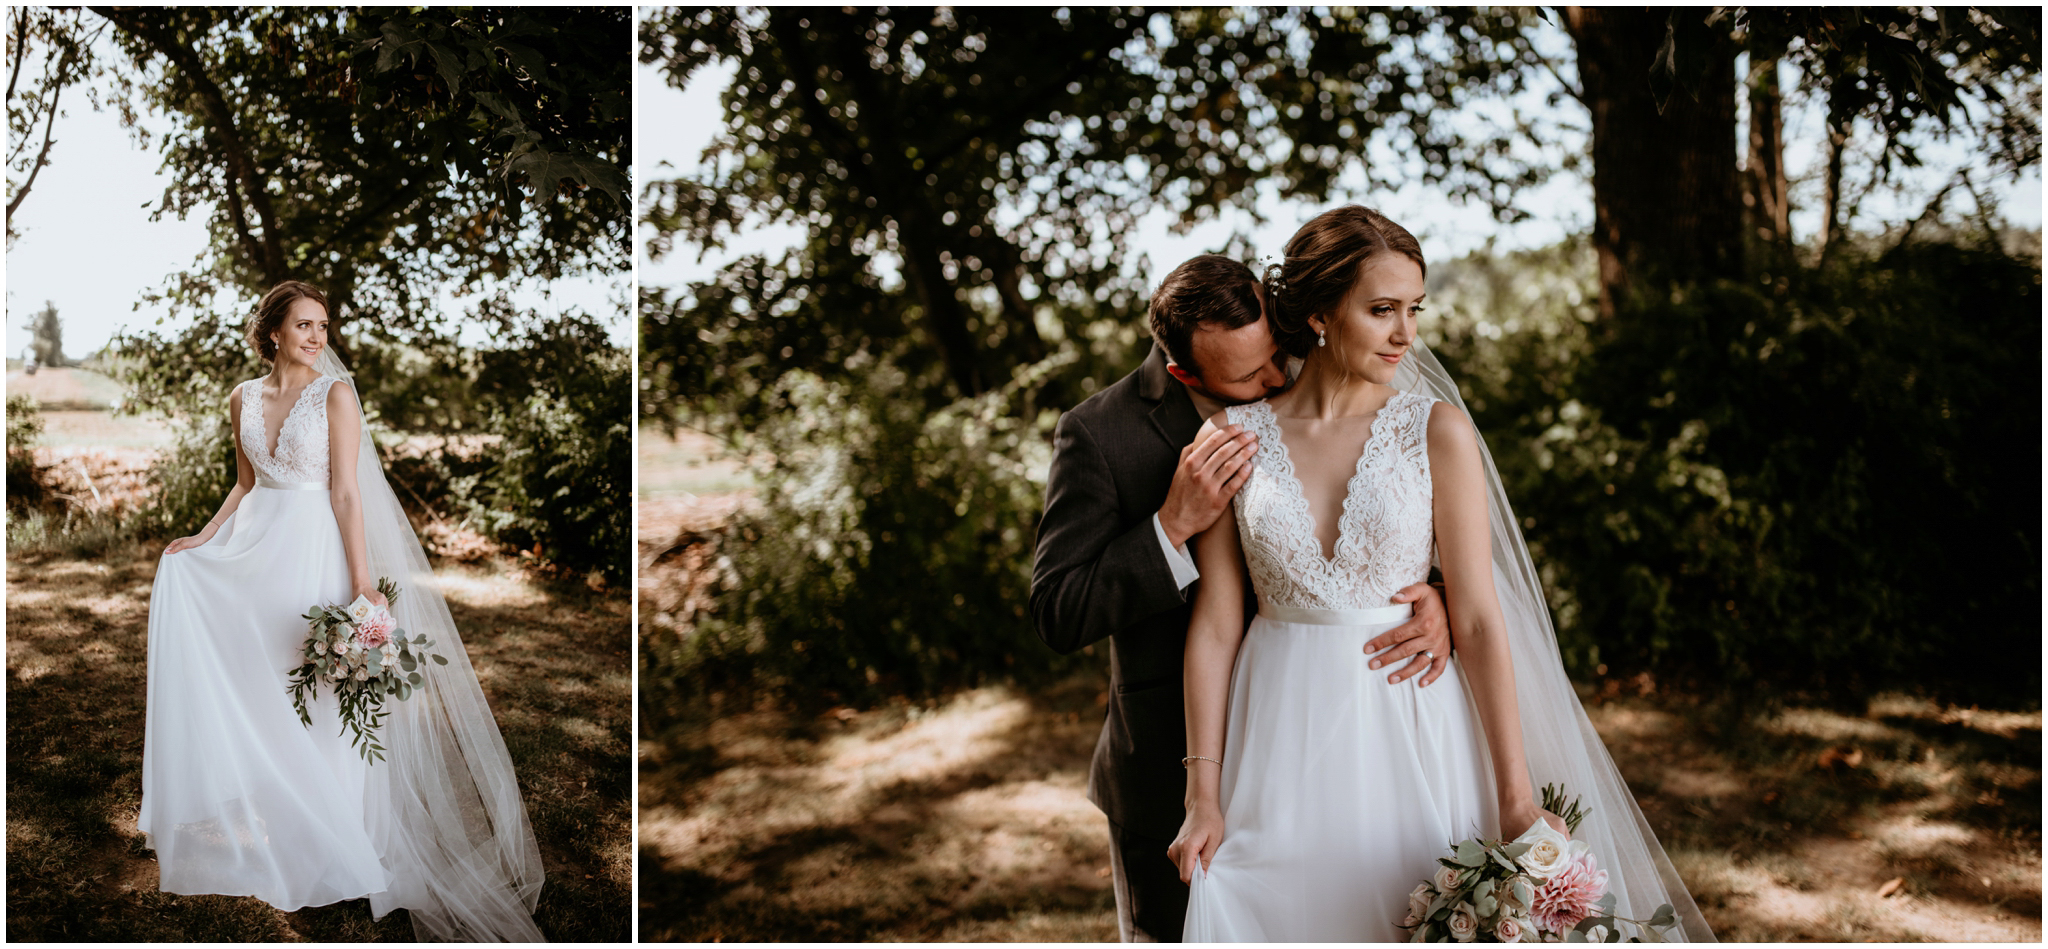 erin-and-tyler-evergreen-gardens-bellingham-wedding-photographer-078.jpg